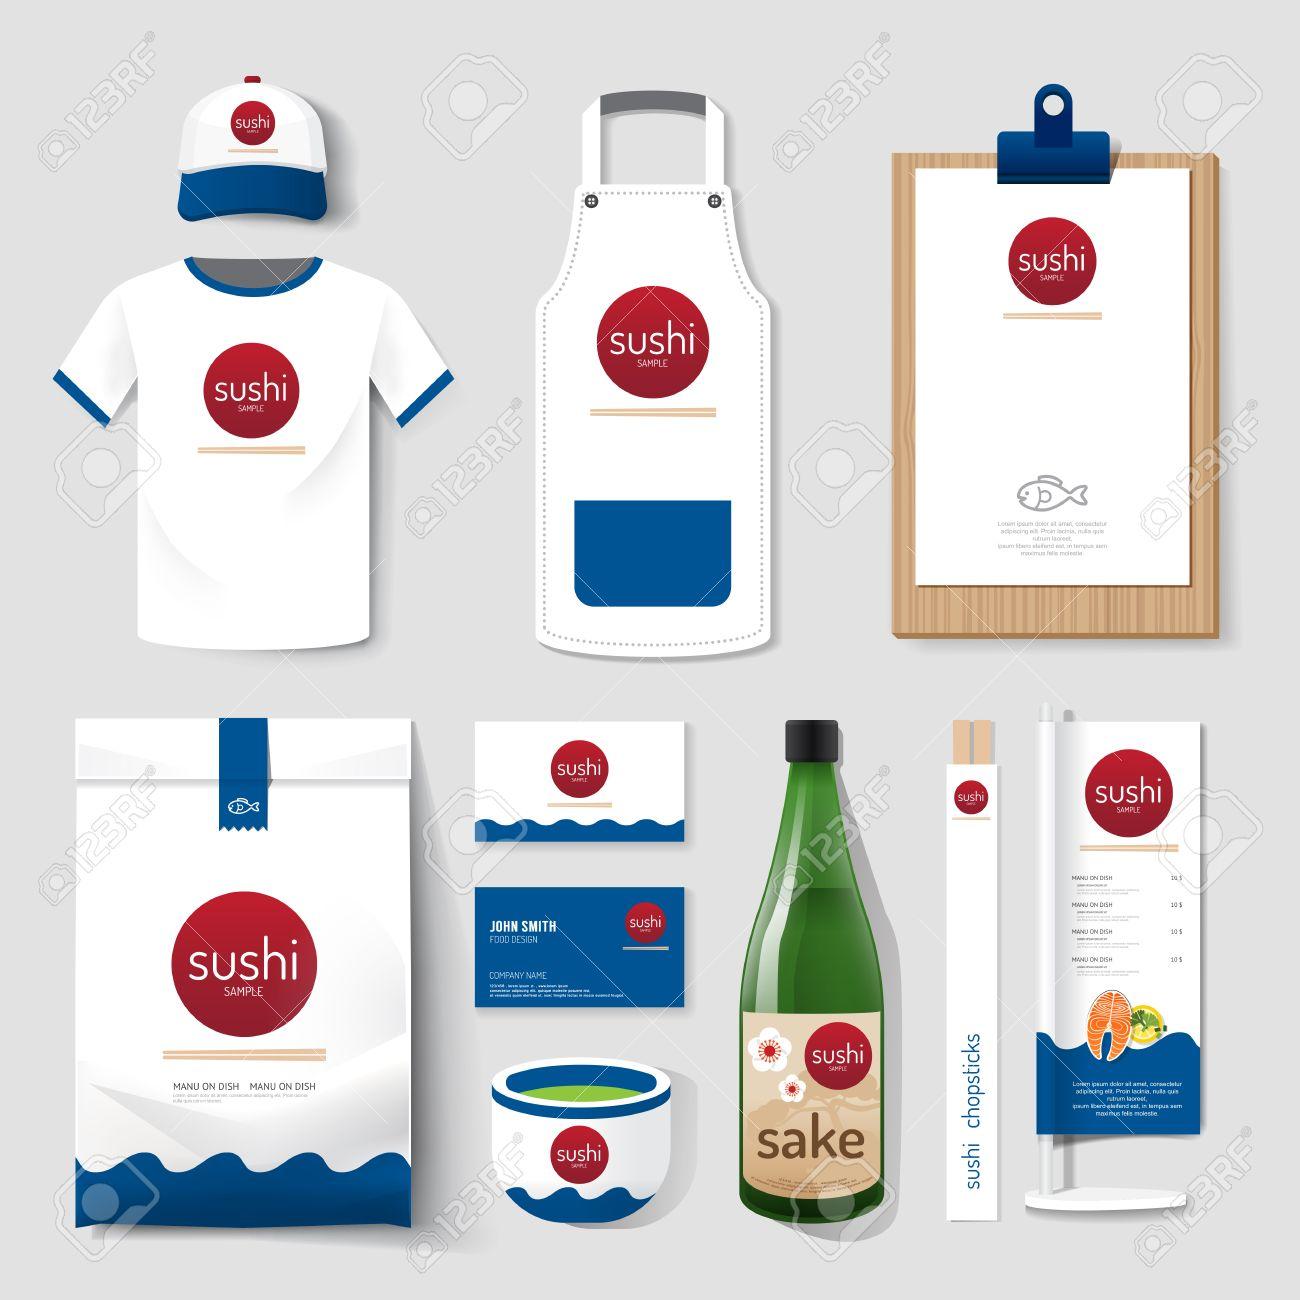 Shirt uniform design vector - Vector Vector Restaurant Cafe Set Flyer Menu Package T Shirt Cap Uniform Design Layout Set Of Japan Food Corporate Identity Template